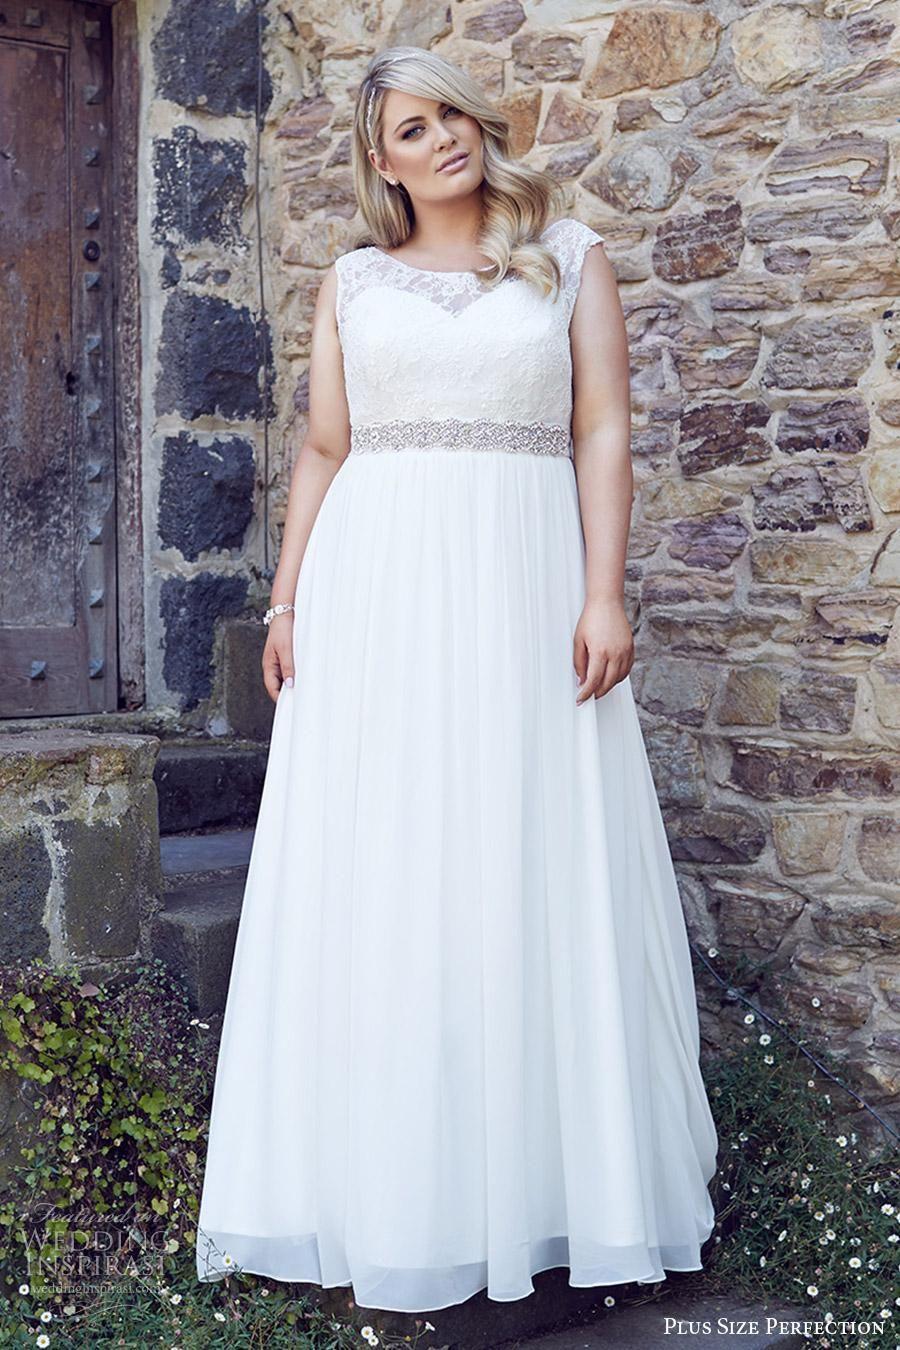 19+ Rustic lace wedding dress cheap ideas